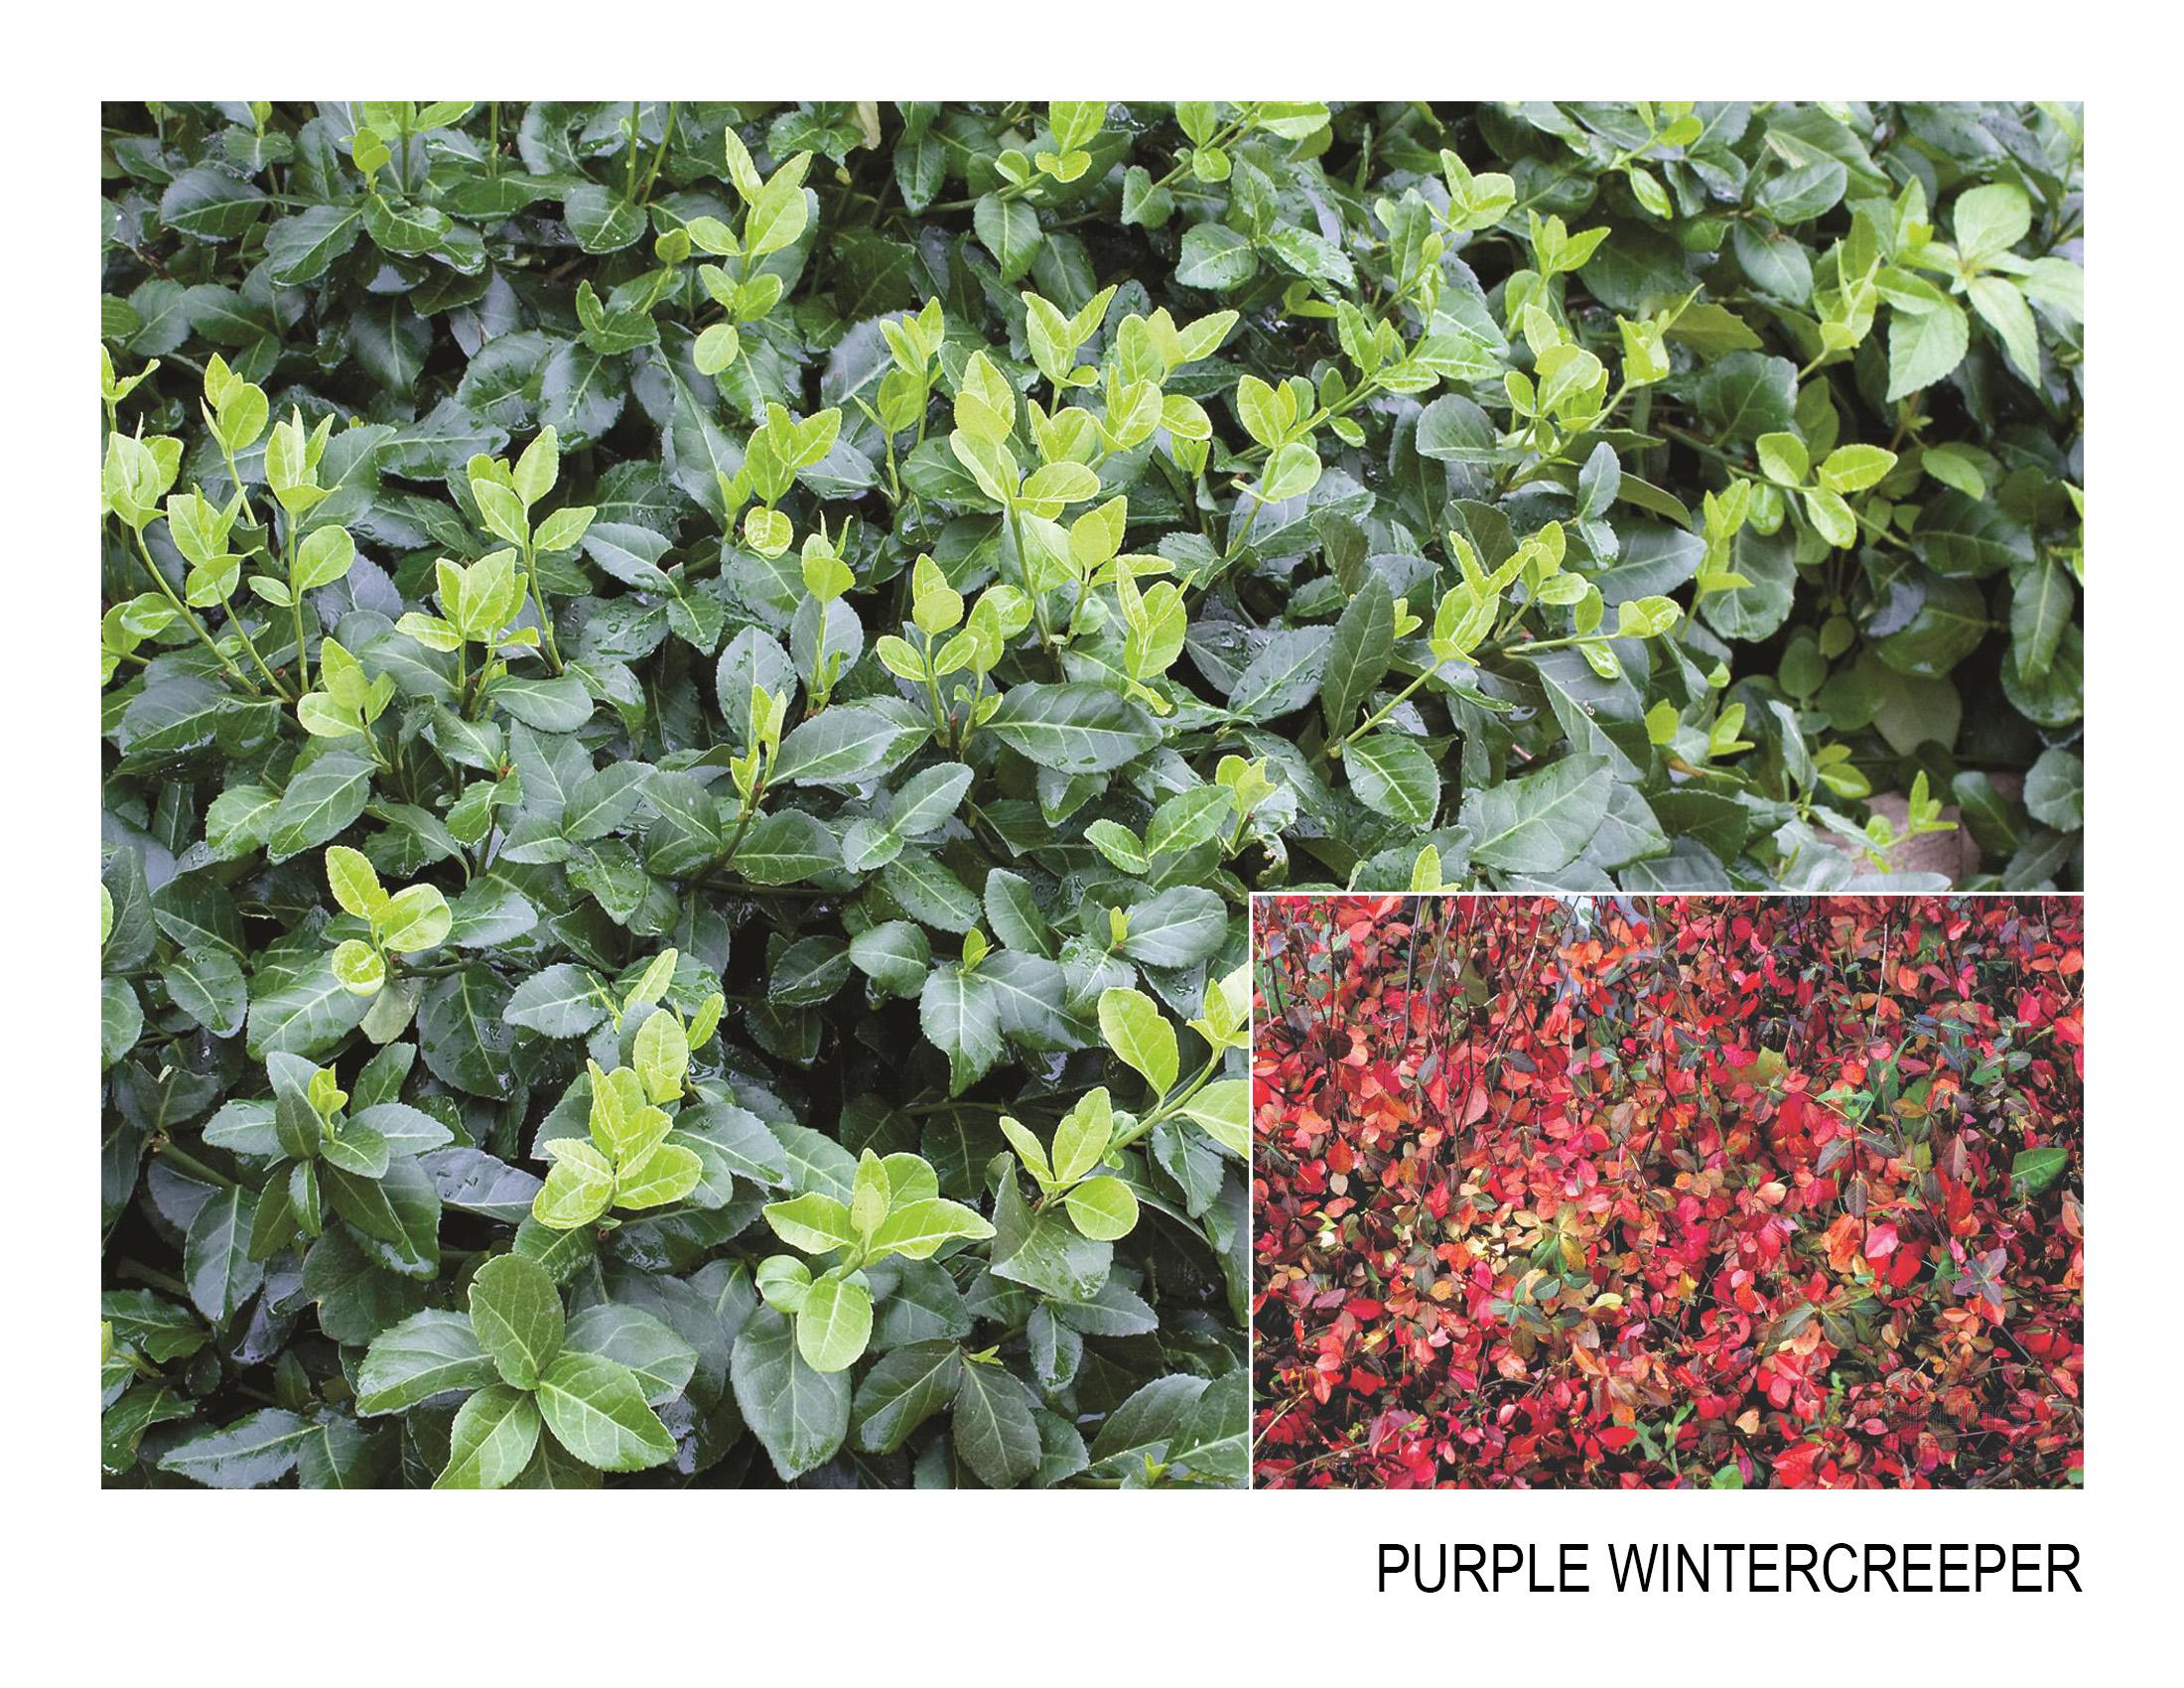 purple wintercreeper.jpg